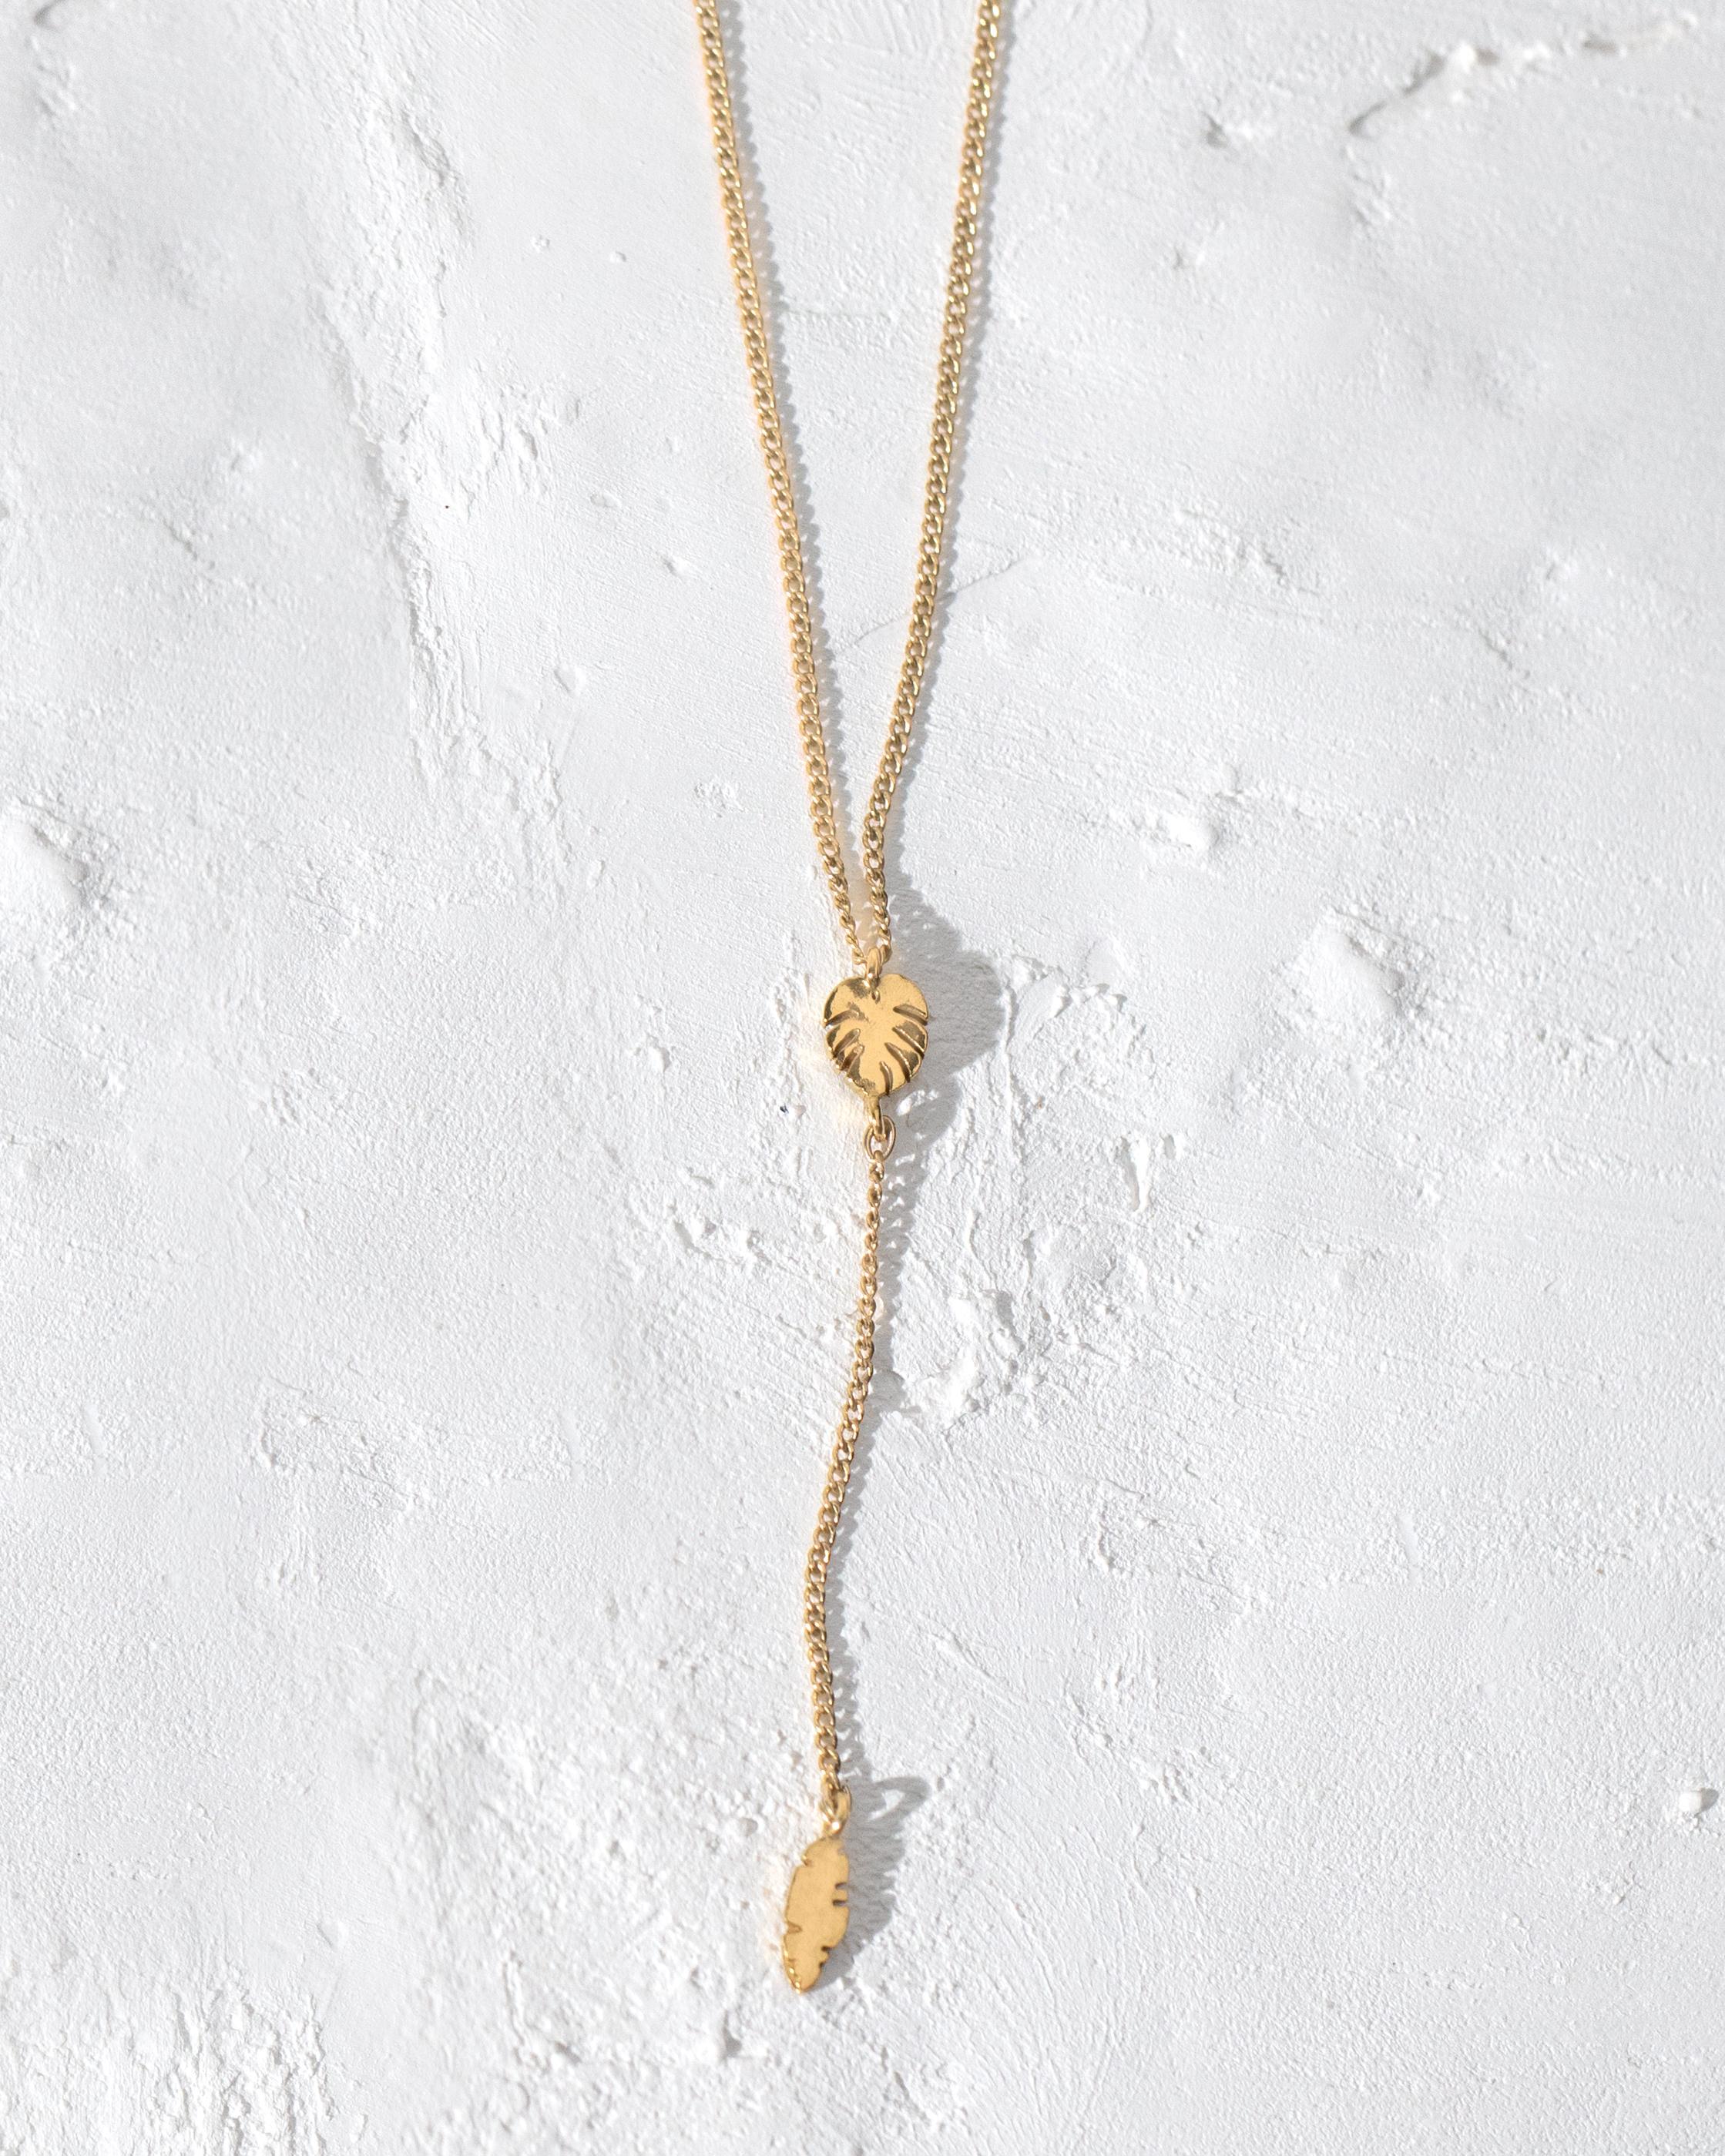 neck_lariat_gold_02.jpg